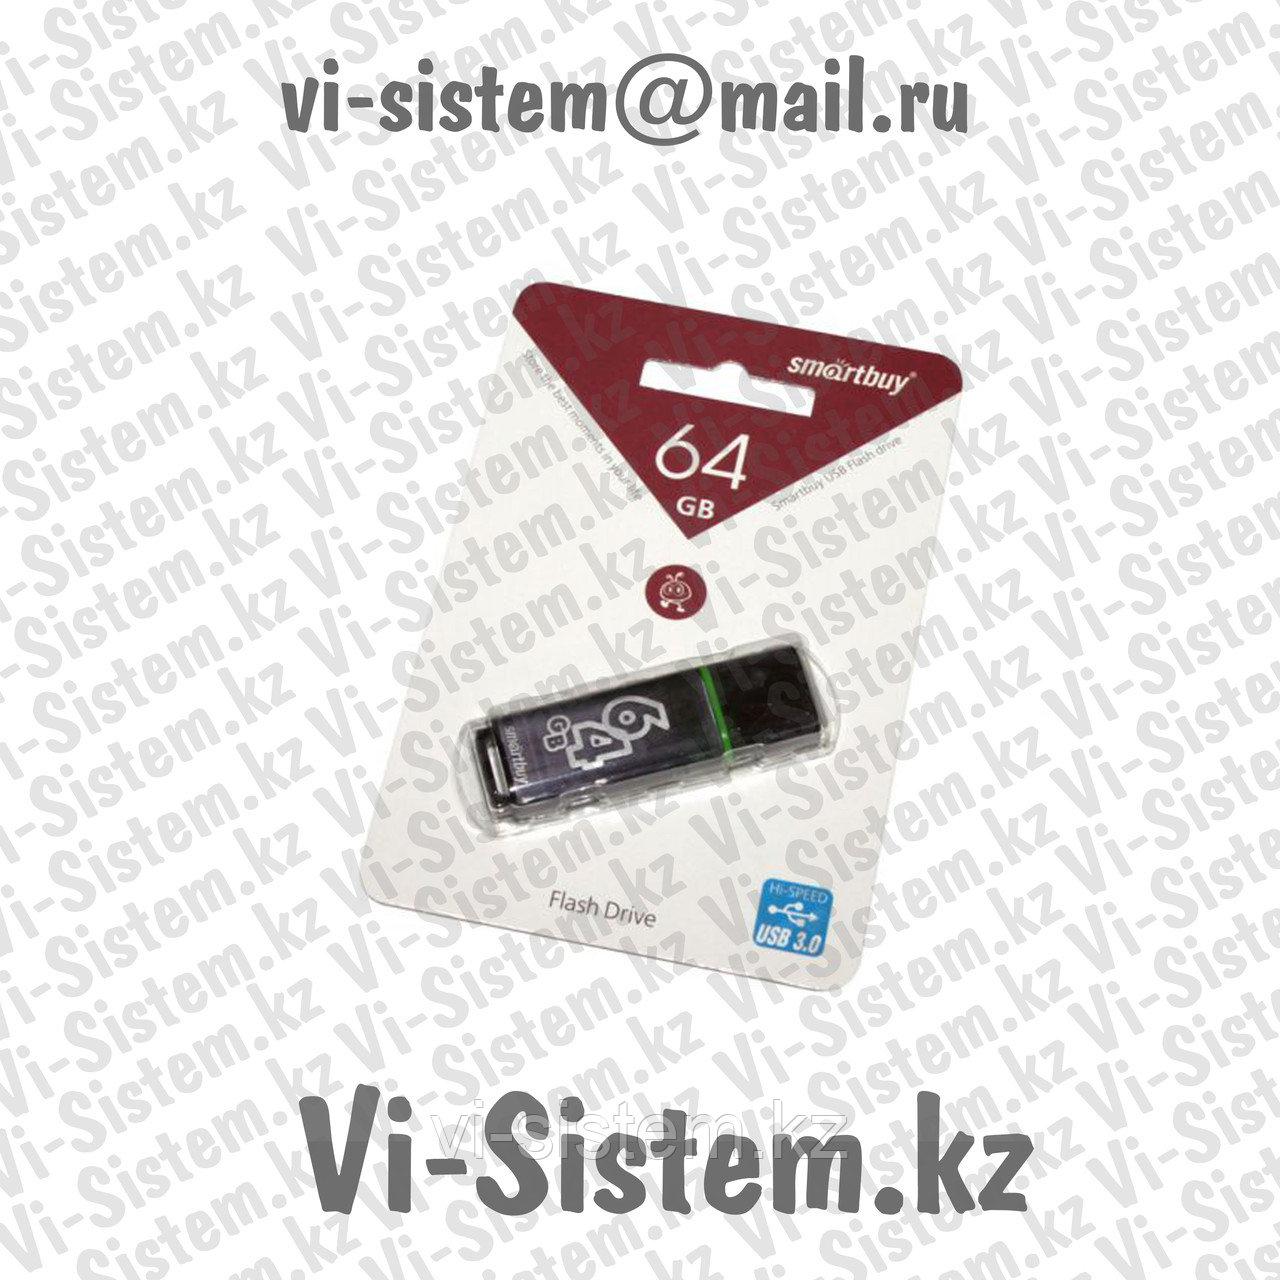 USB 3.0 Флеш Накопитель SmartBuy 64GB (Флешка)